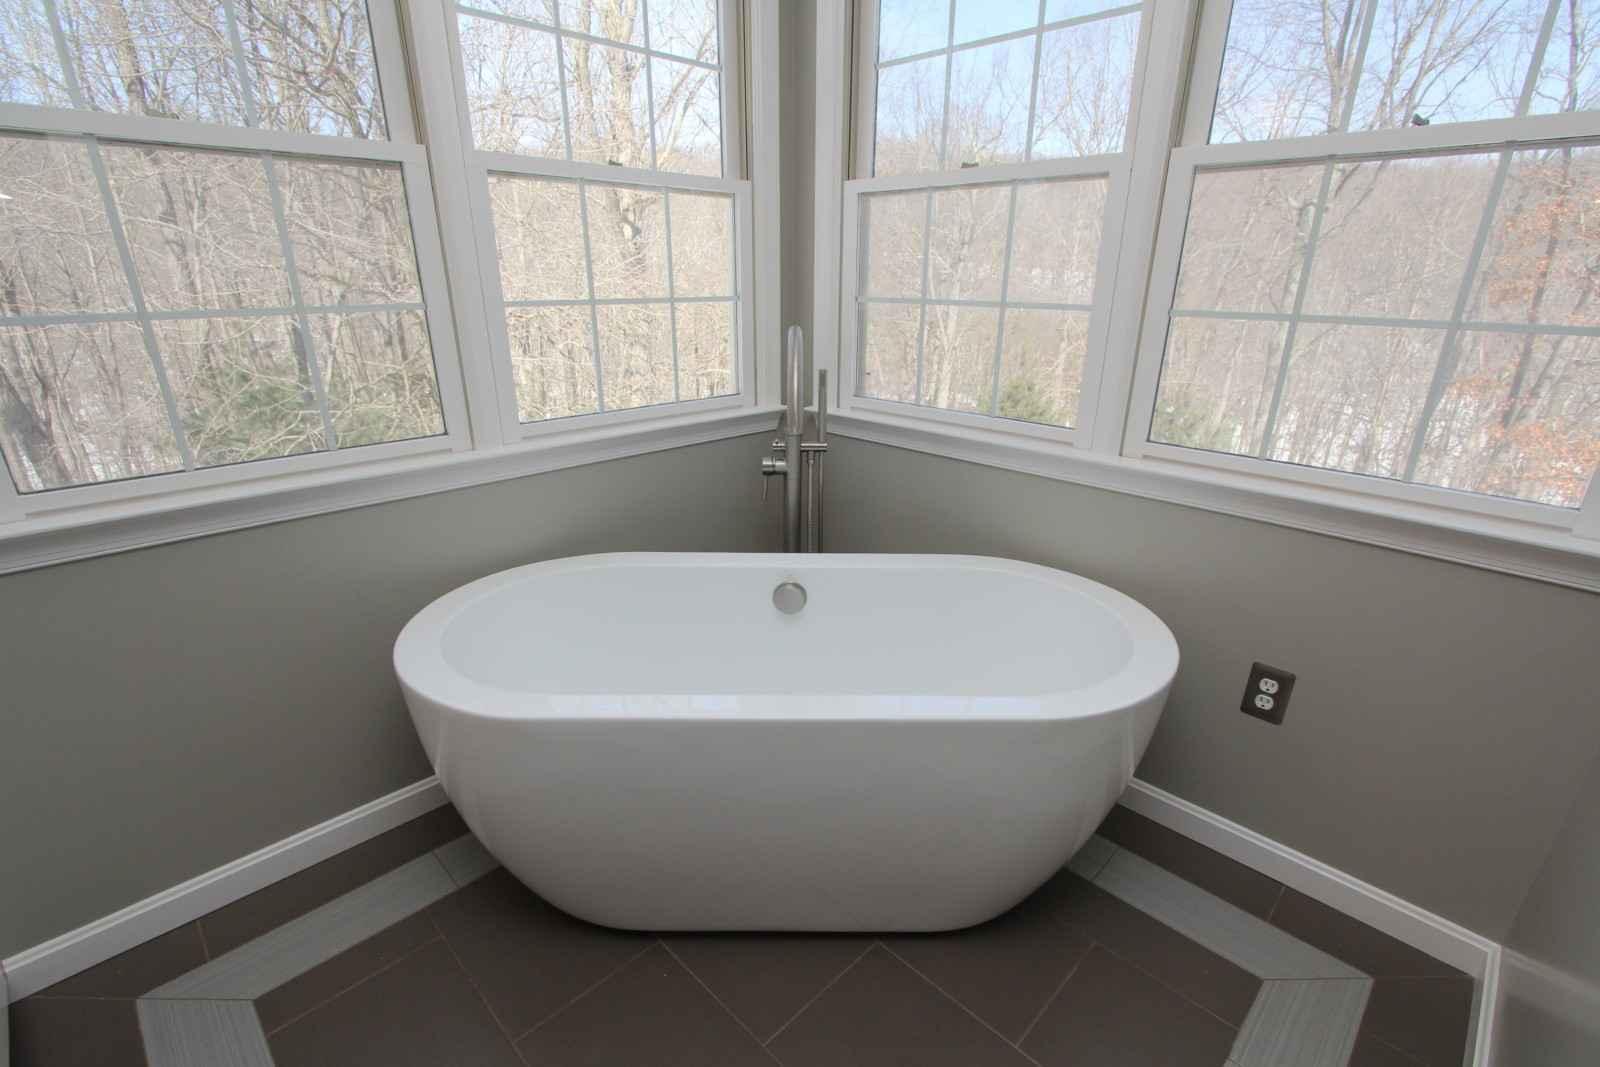 freestanding tub in remodeled bathroom